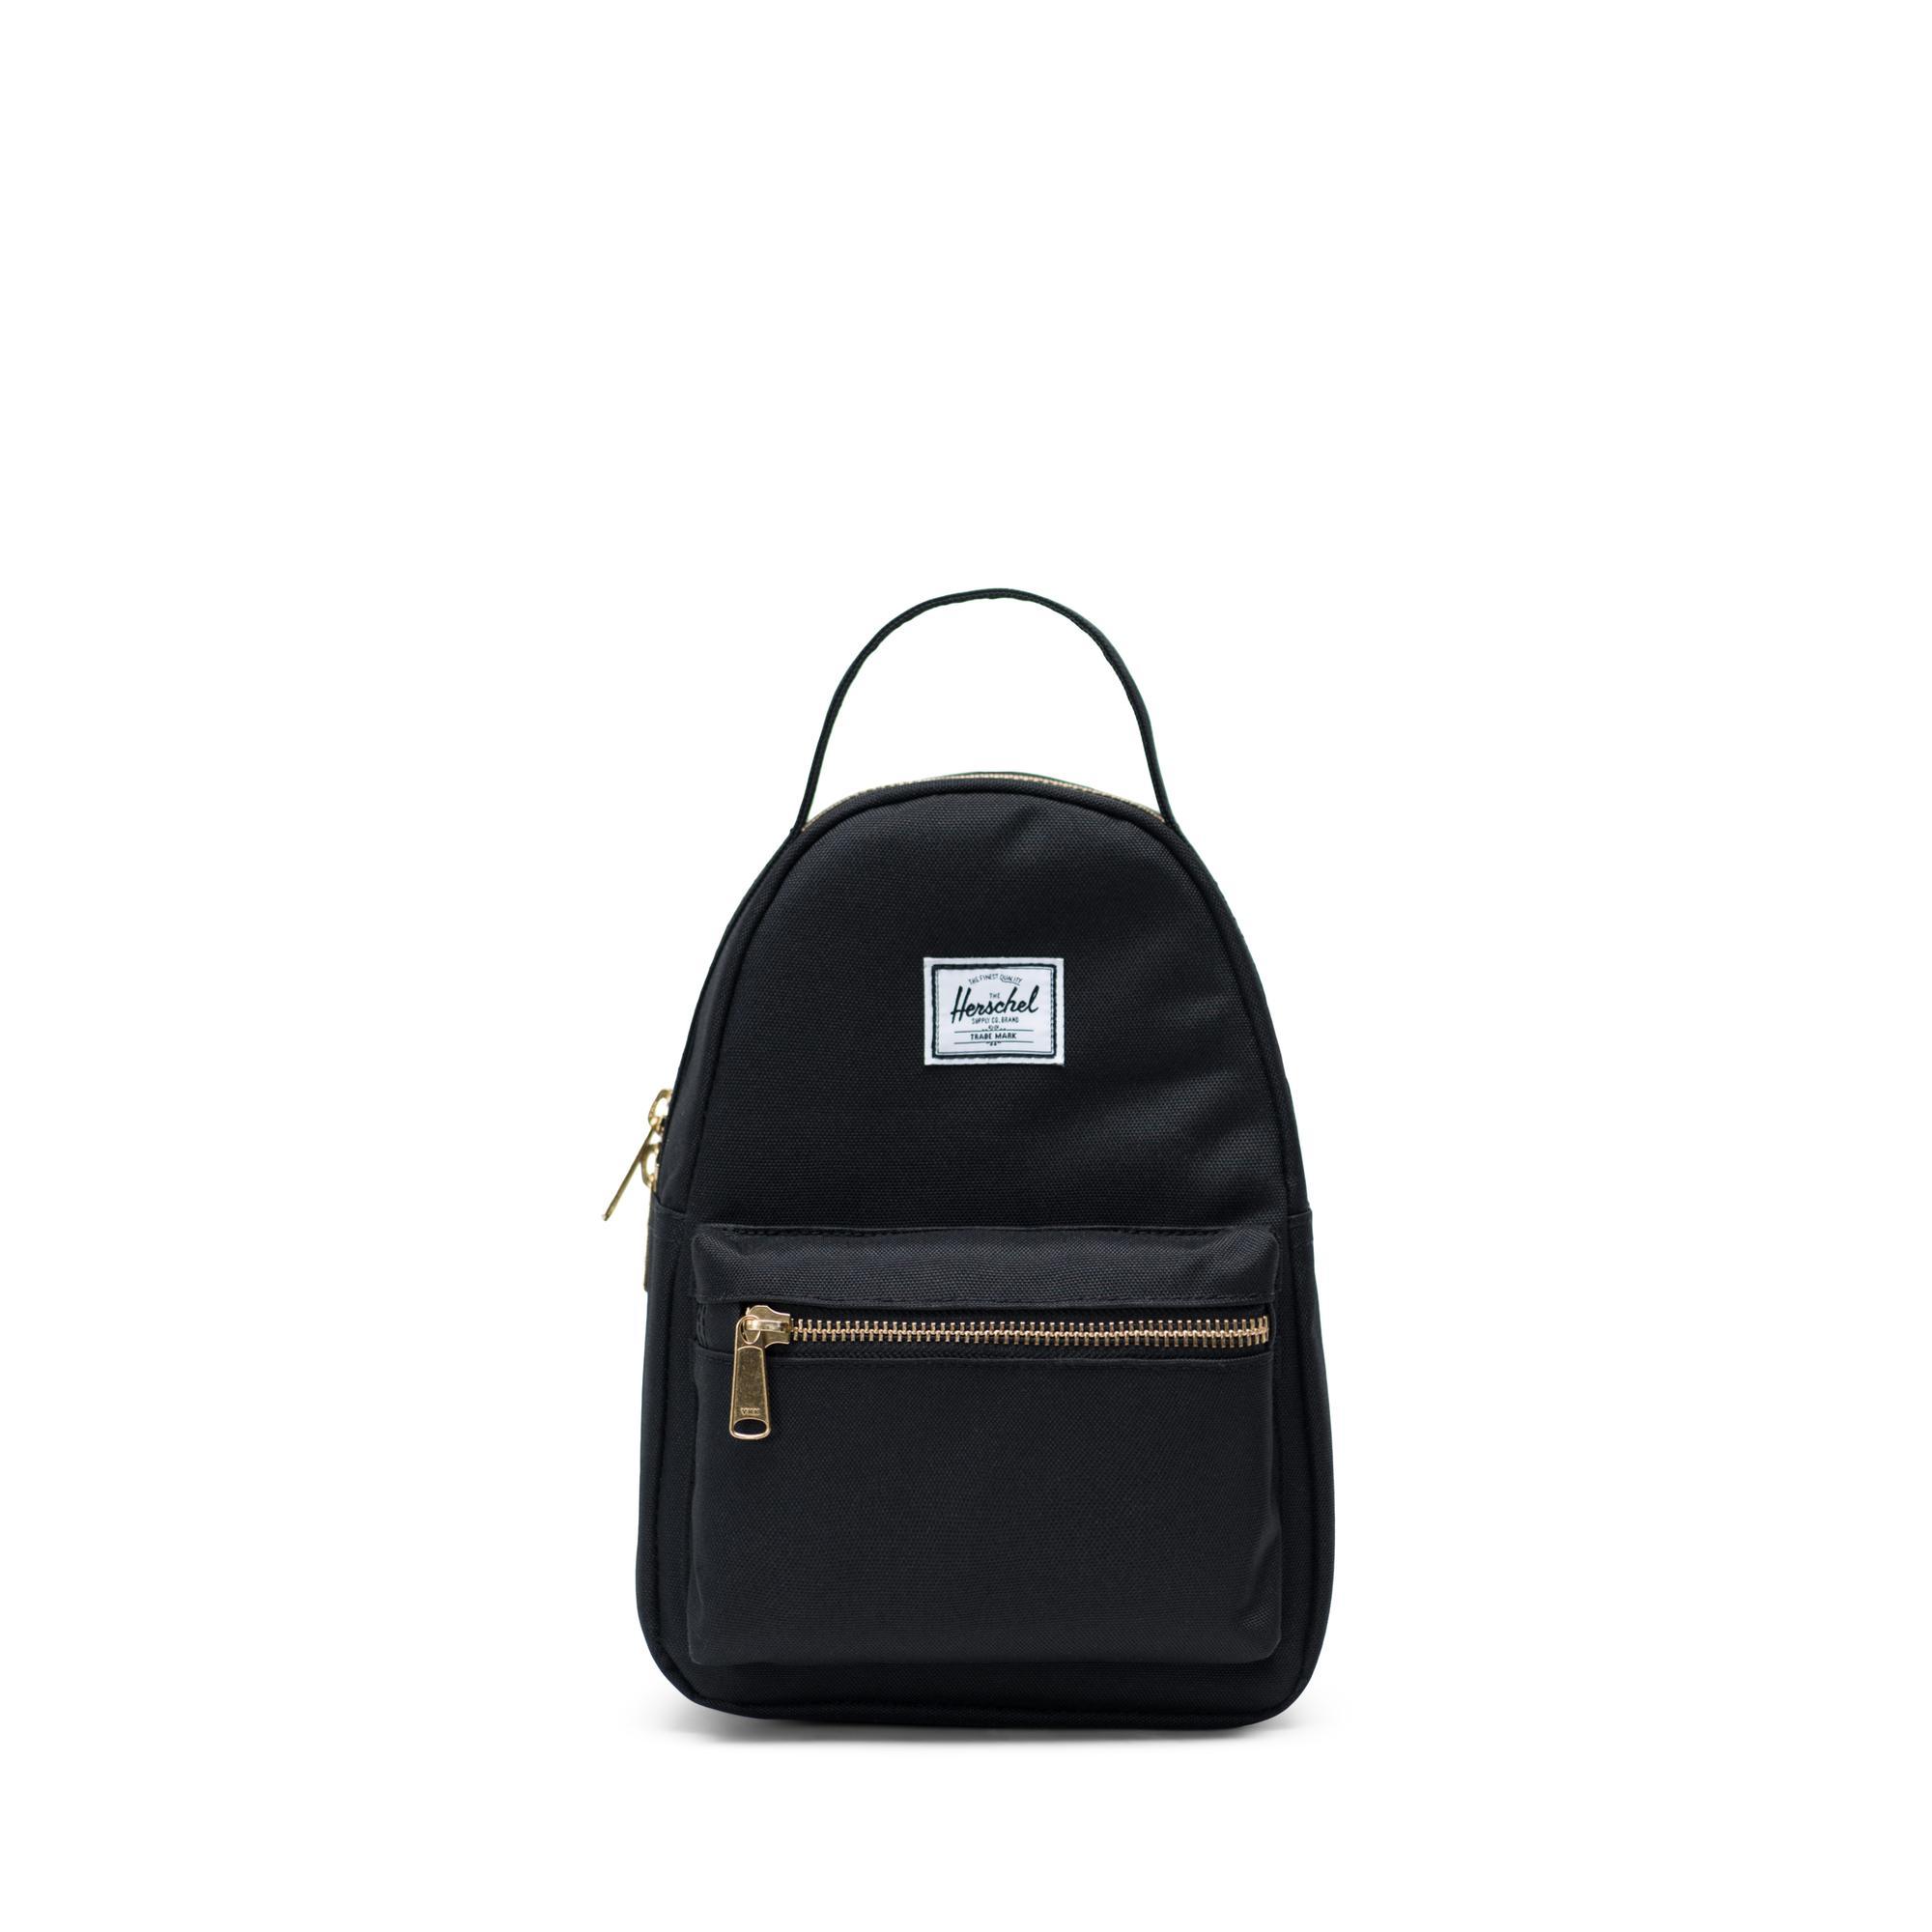 49bfdf2fadc9 Nova Backpack Mini